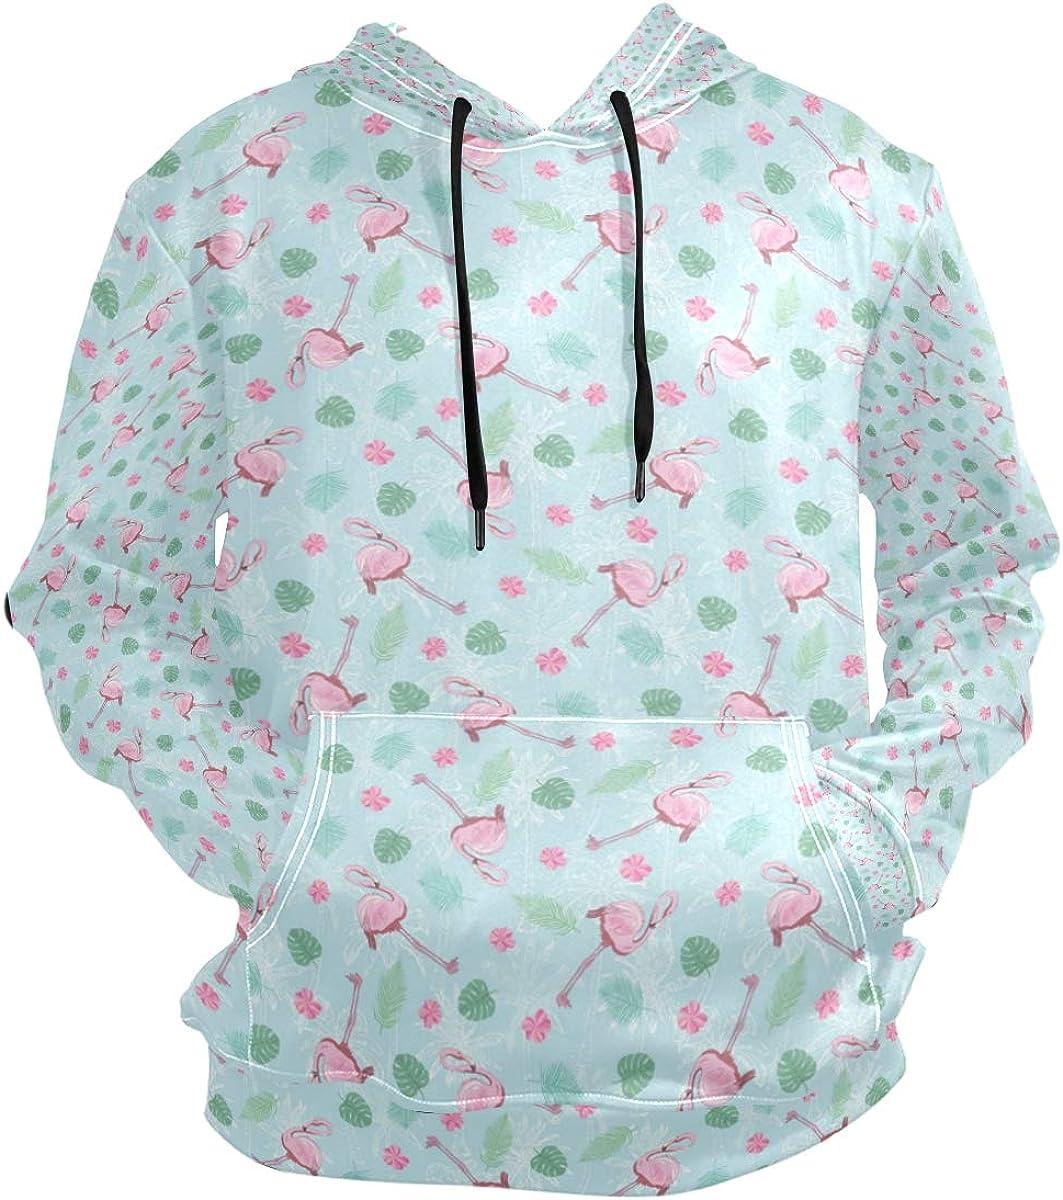 Flamingo Tropical Plants and Jungle Mens Hoodies /& Sweatshirts Long Pullover